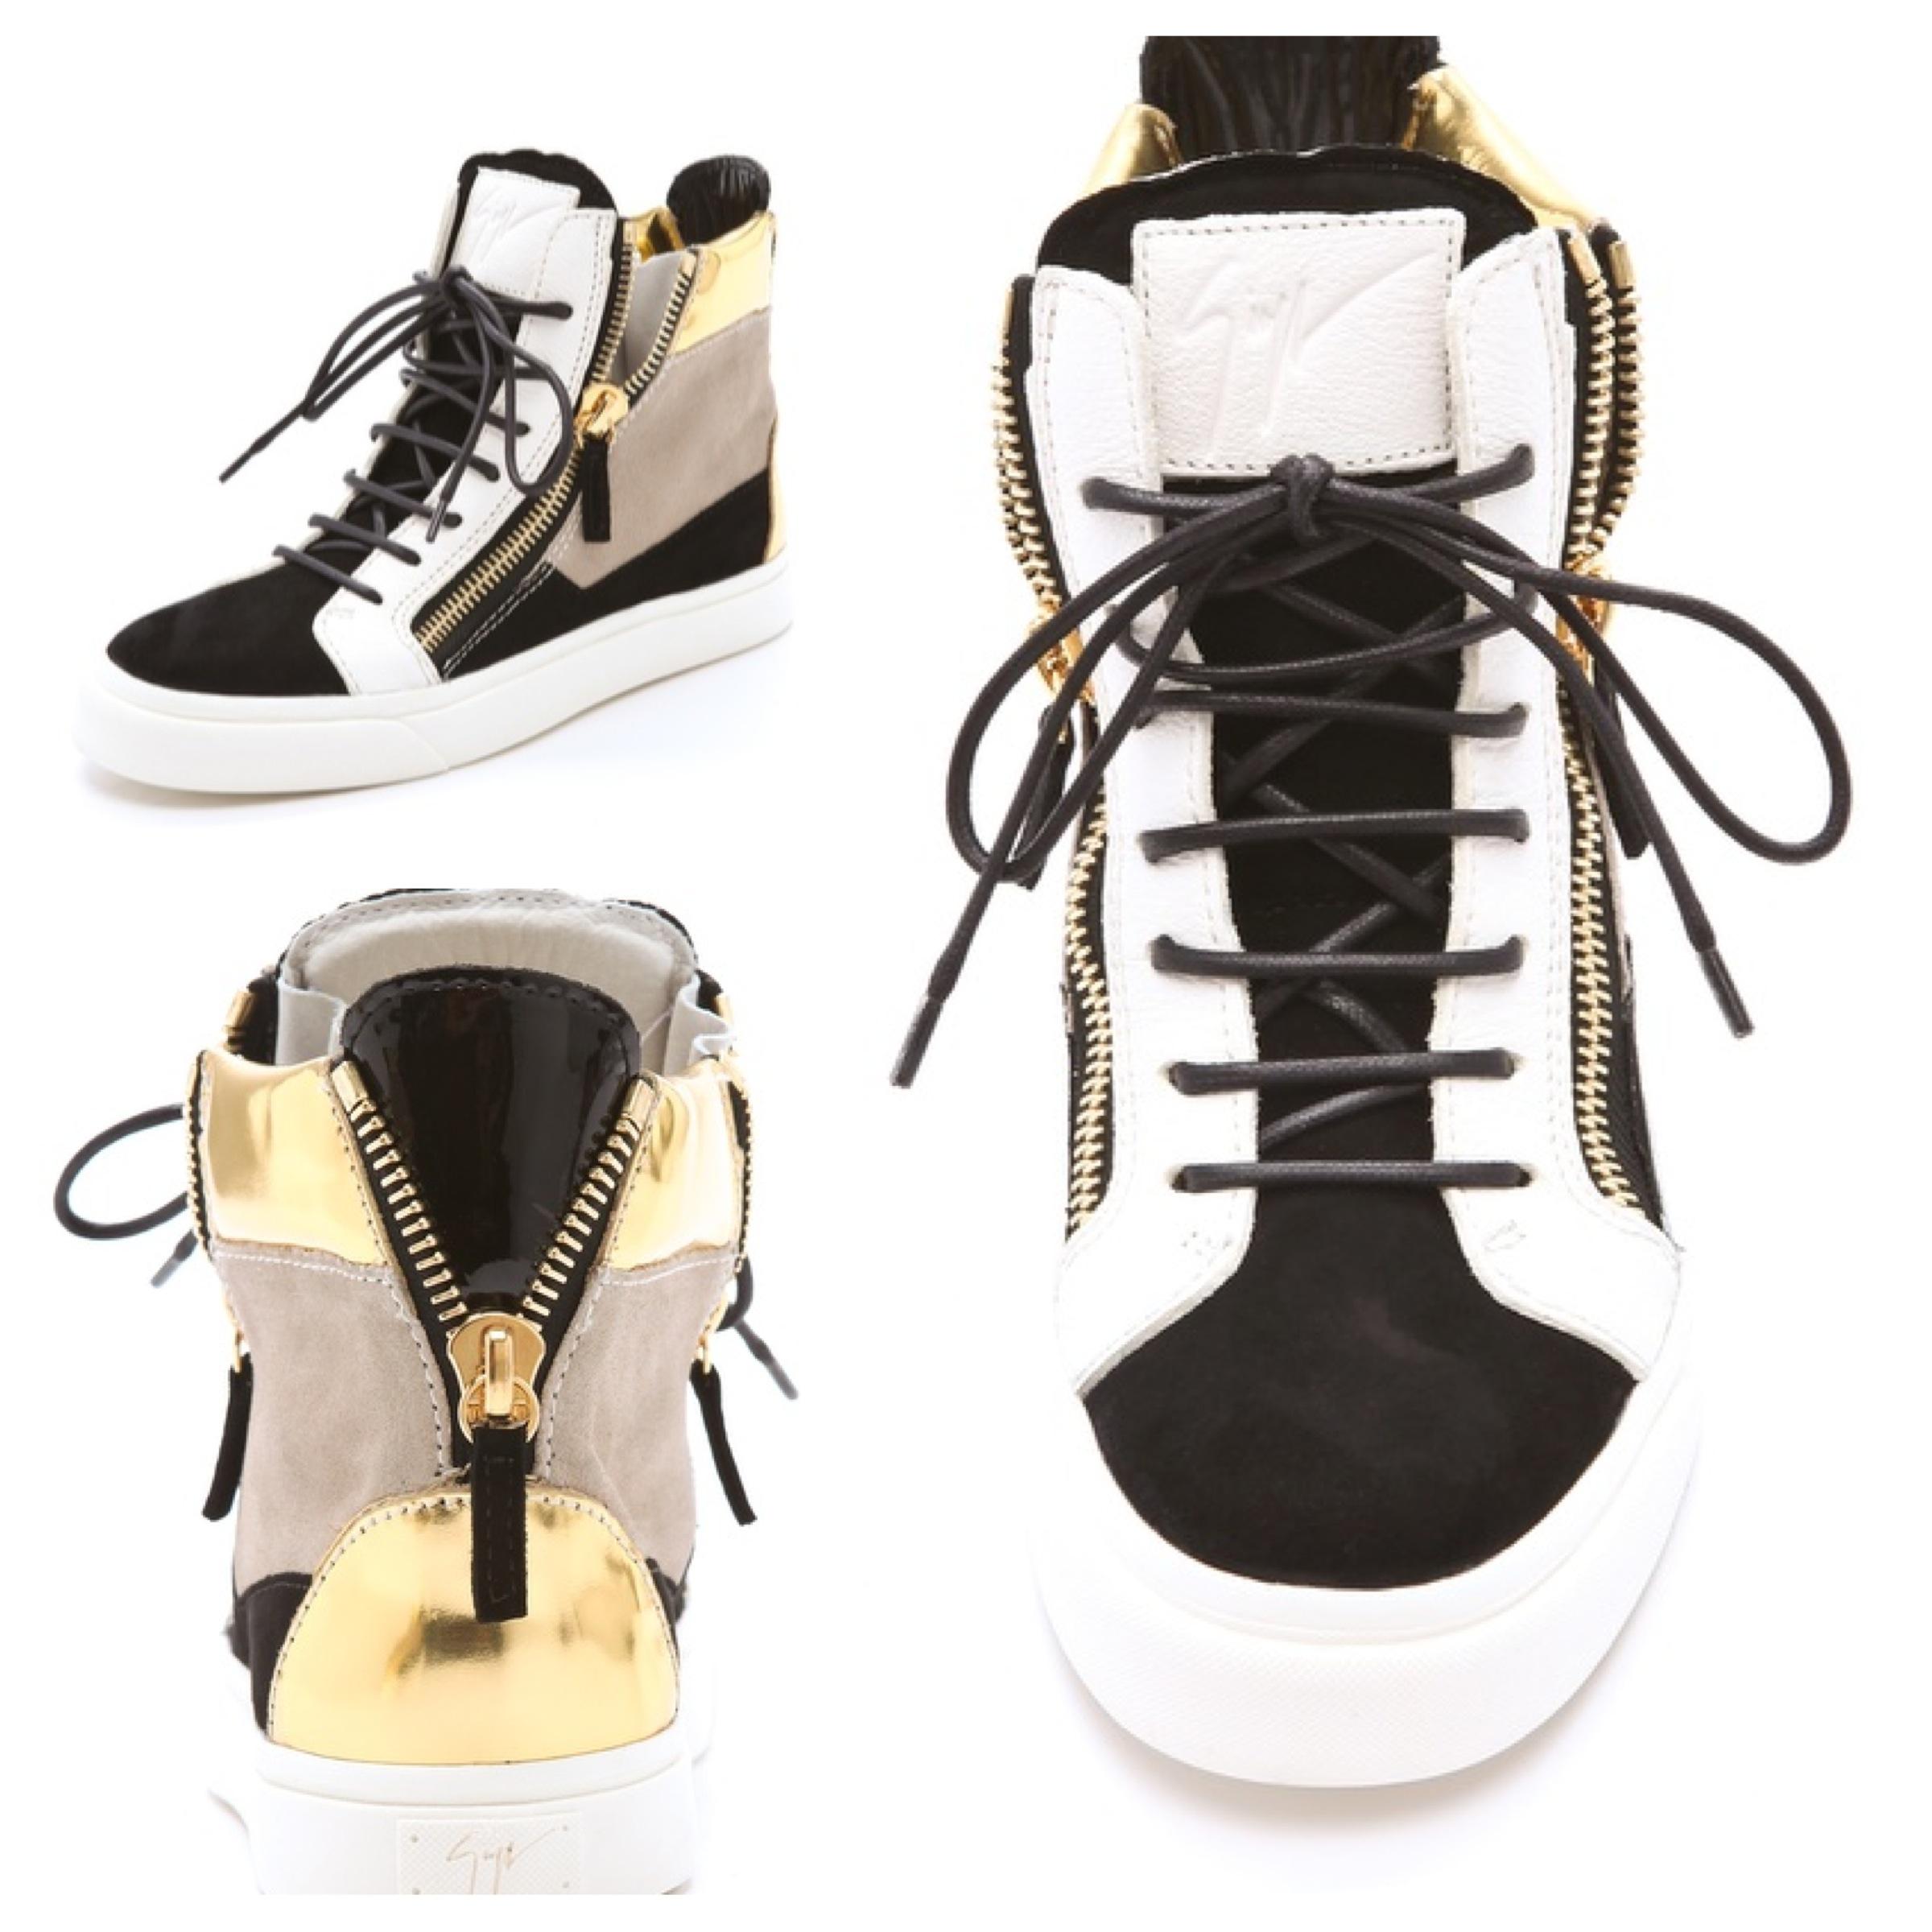 France Giuseppe Zanotti Sneakers - 2012 08 26 Giuseppe Zanotti Double Zip Laceup Sneakers